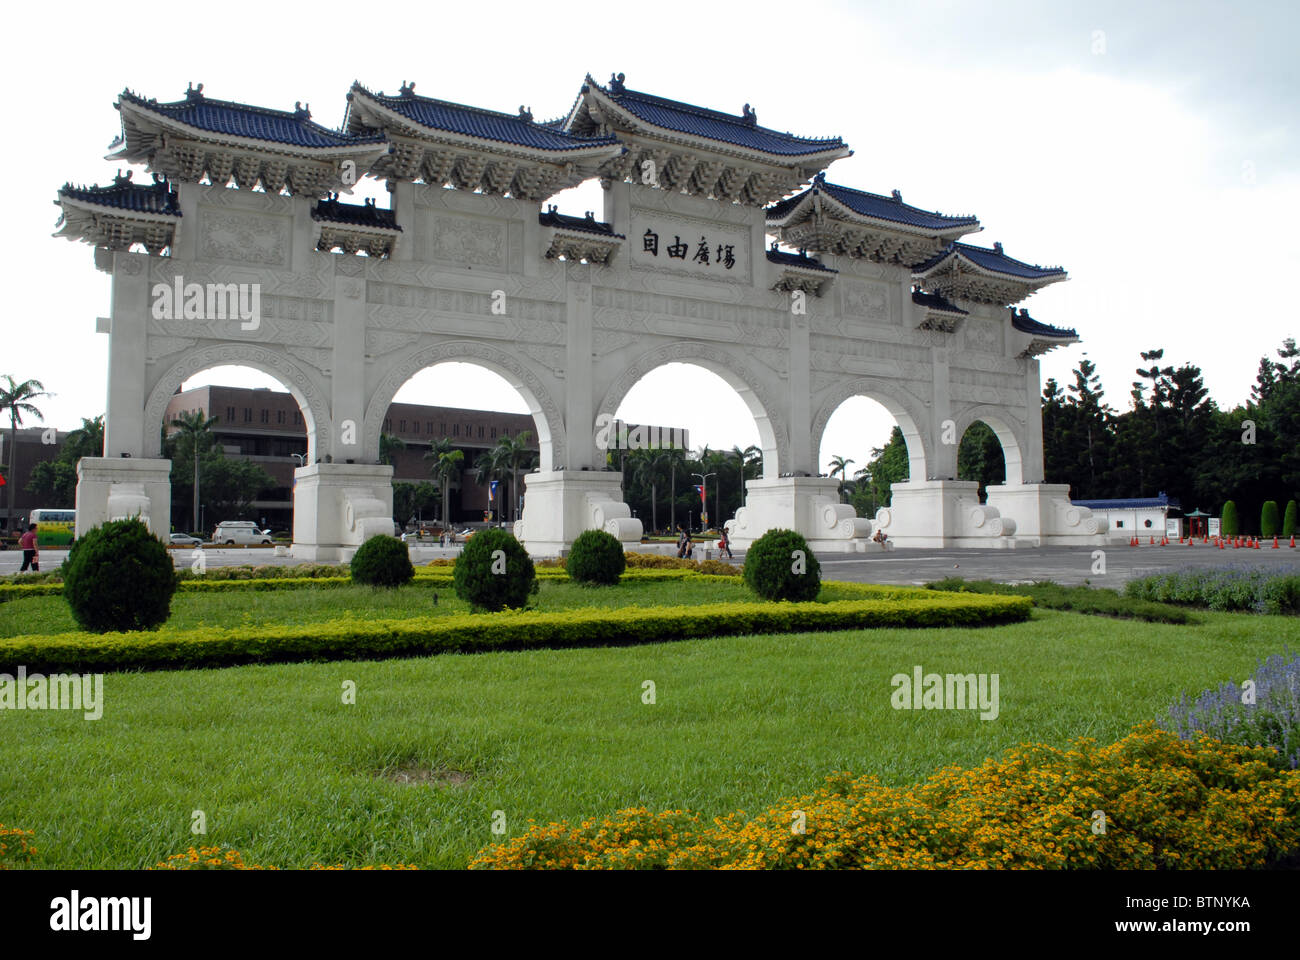 Cancello per Chiang Kai Shek Memorial Taipei, Taiwan. Immagini Stock